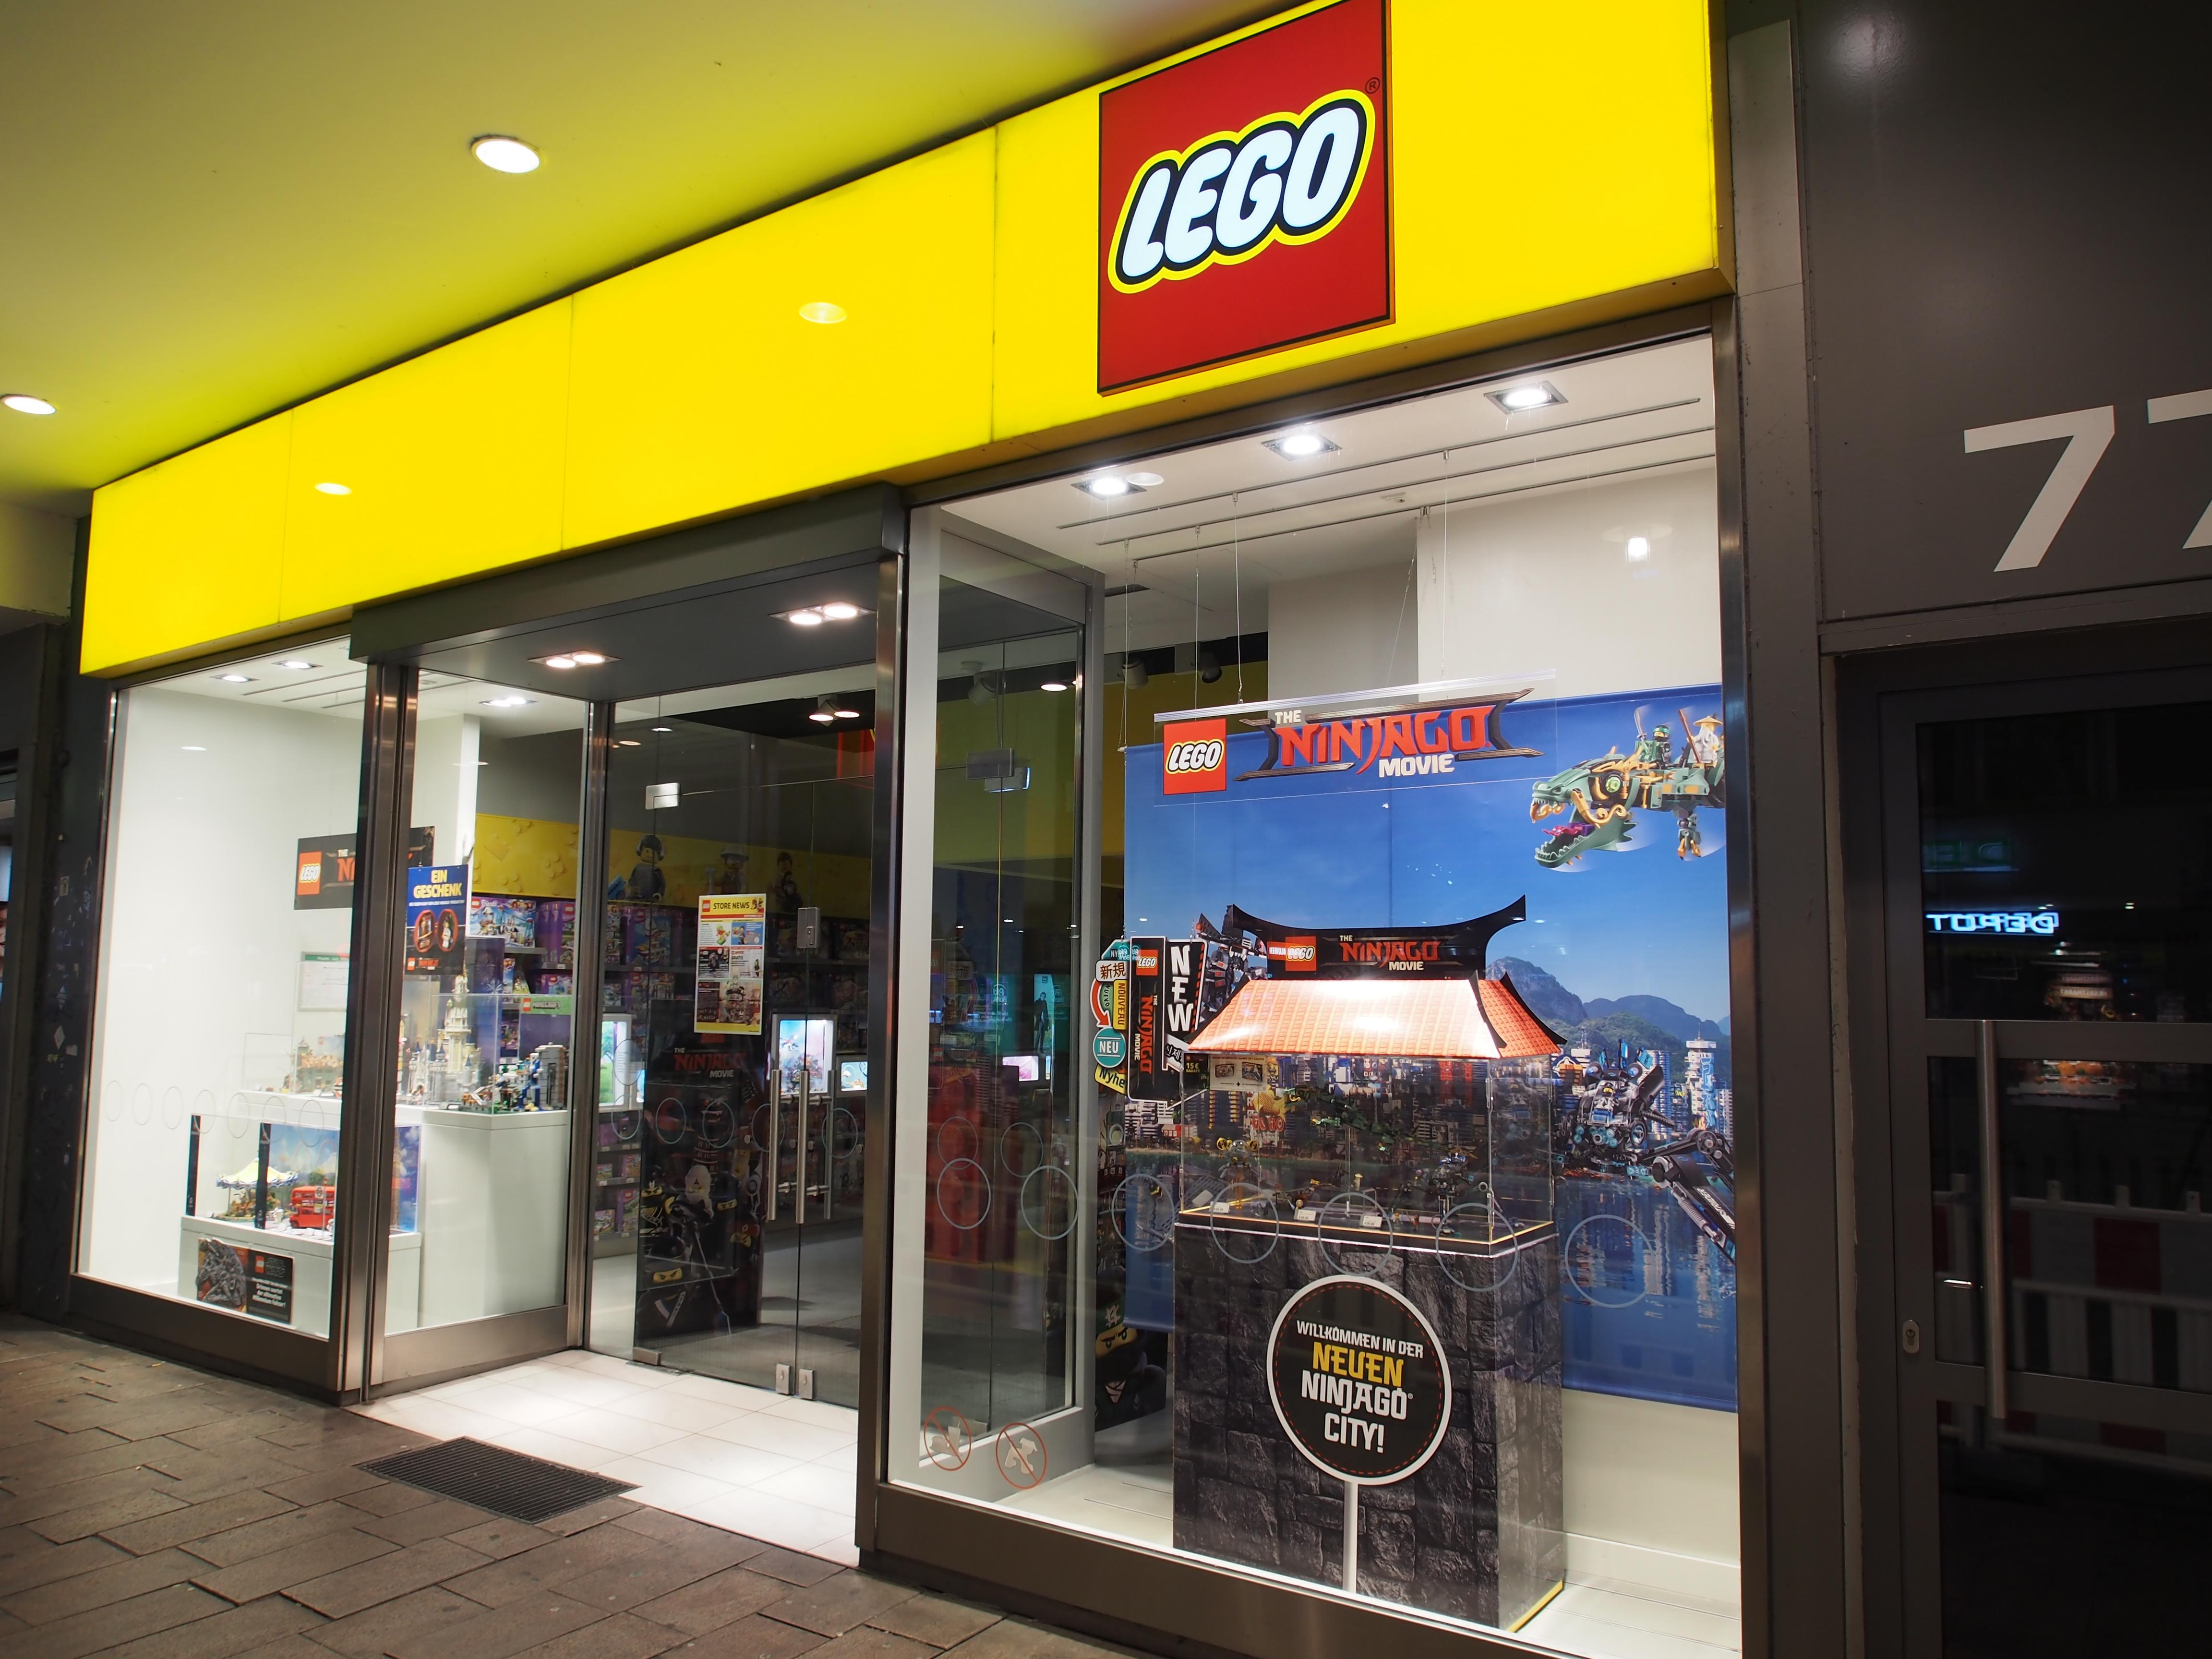 Lego Laden%2C Bahnhofstrasse%2C Saarbr%C3%BCcken Bild 1